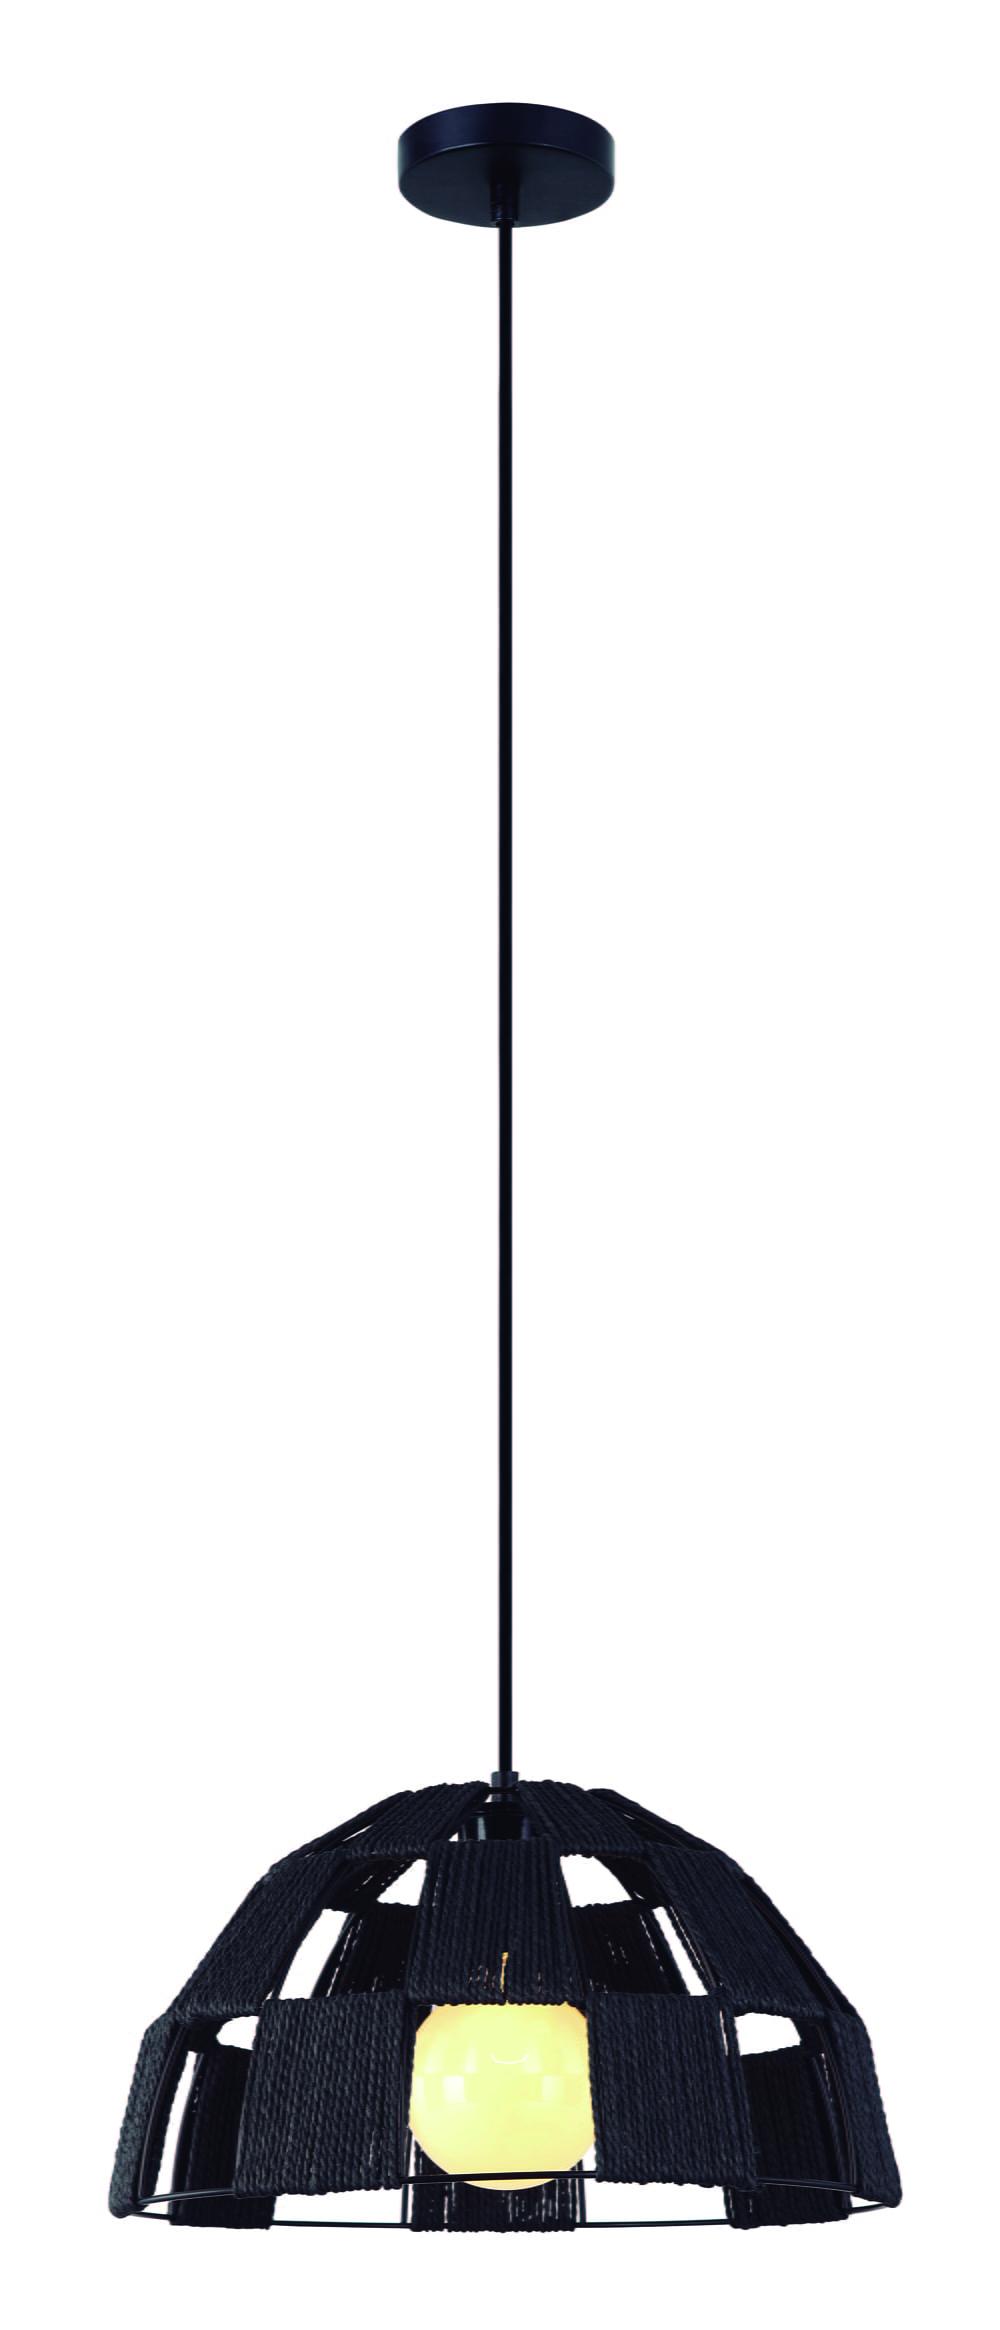 Meia Lua Grande - Pendente Vazado de Ferro + Tecido - Diâmetro 40 cm